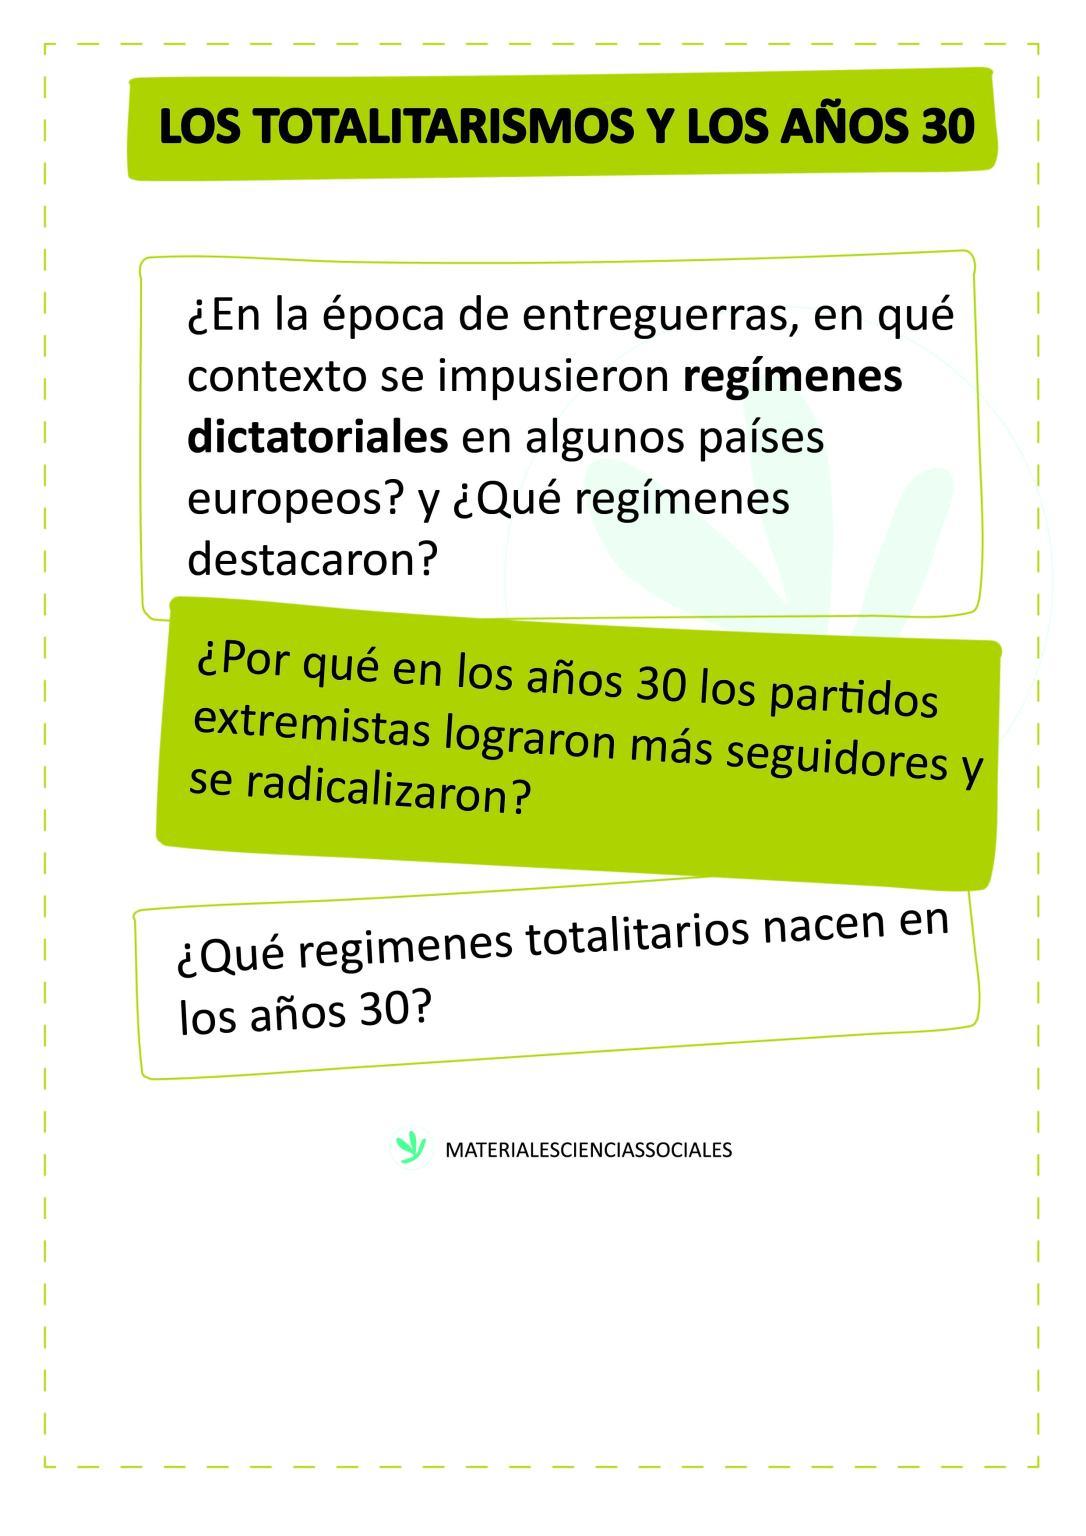 ENTREGUERRAS-03